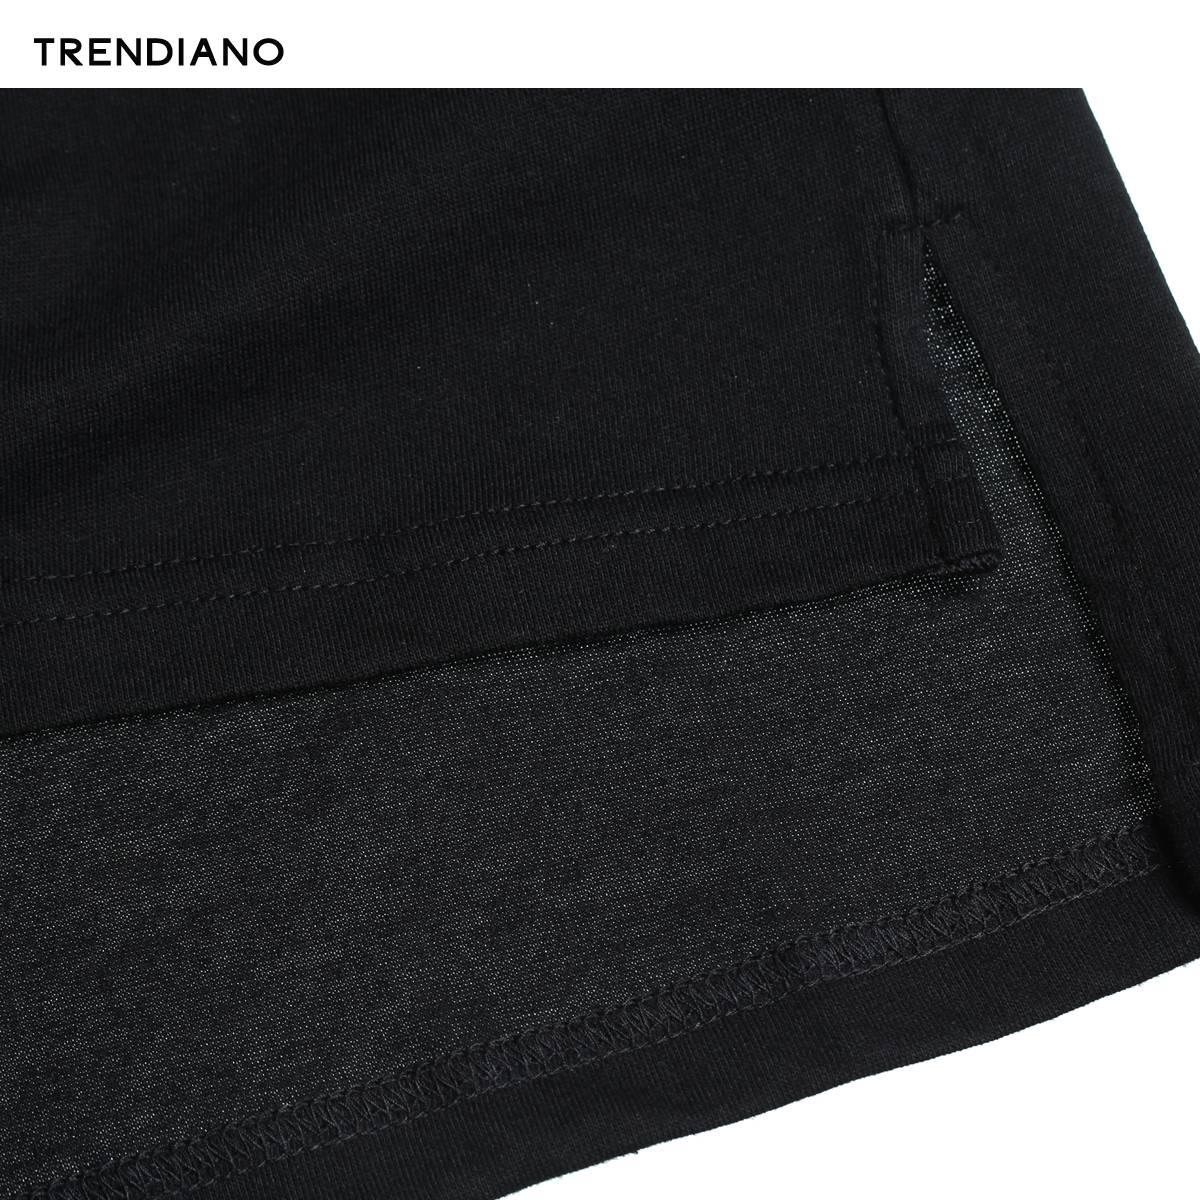 3JI1021890 恤 T 新男装夏装休闲宽松纯棉印花中长圆领短袖 TRENDIANO